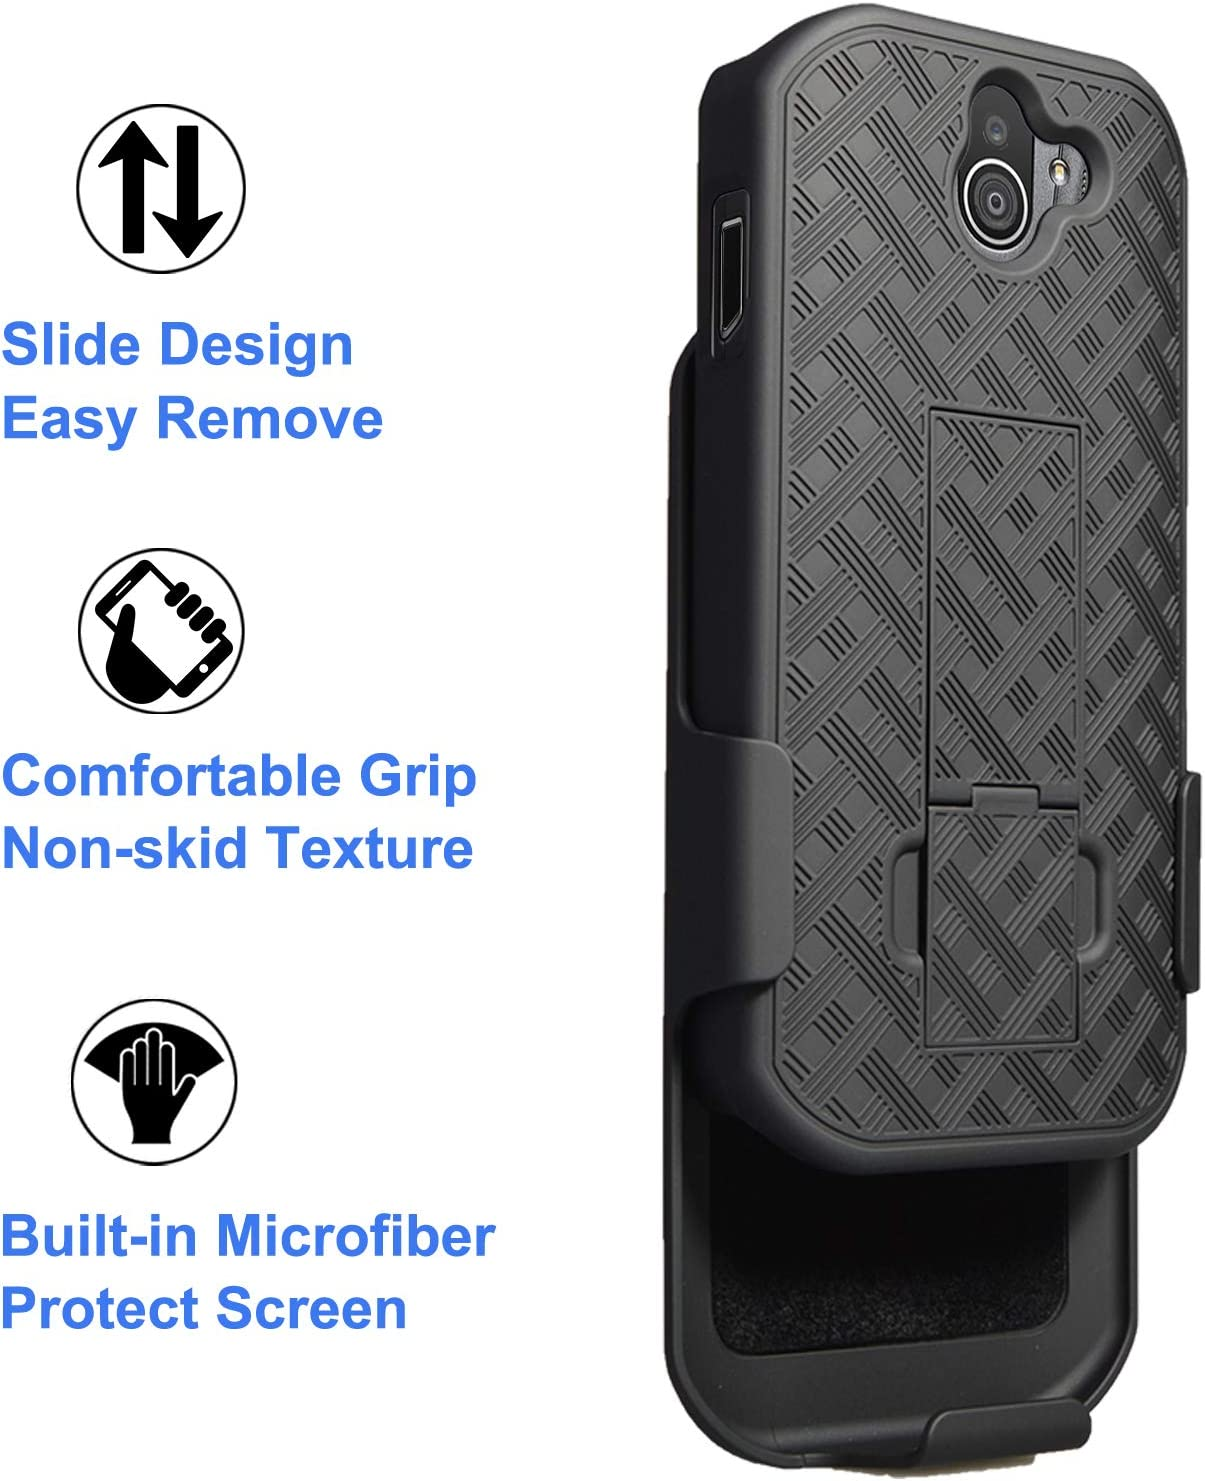 Swivel Belt Clip Ailiber E6910 Holster with Screen Protector Kickstand Holder Shock Proof Pouch Slim Shell Slide Cover for Verizon Kyocera Dura Force Pro2 Kyocera DuraForce Pro 2 Case Black